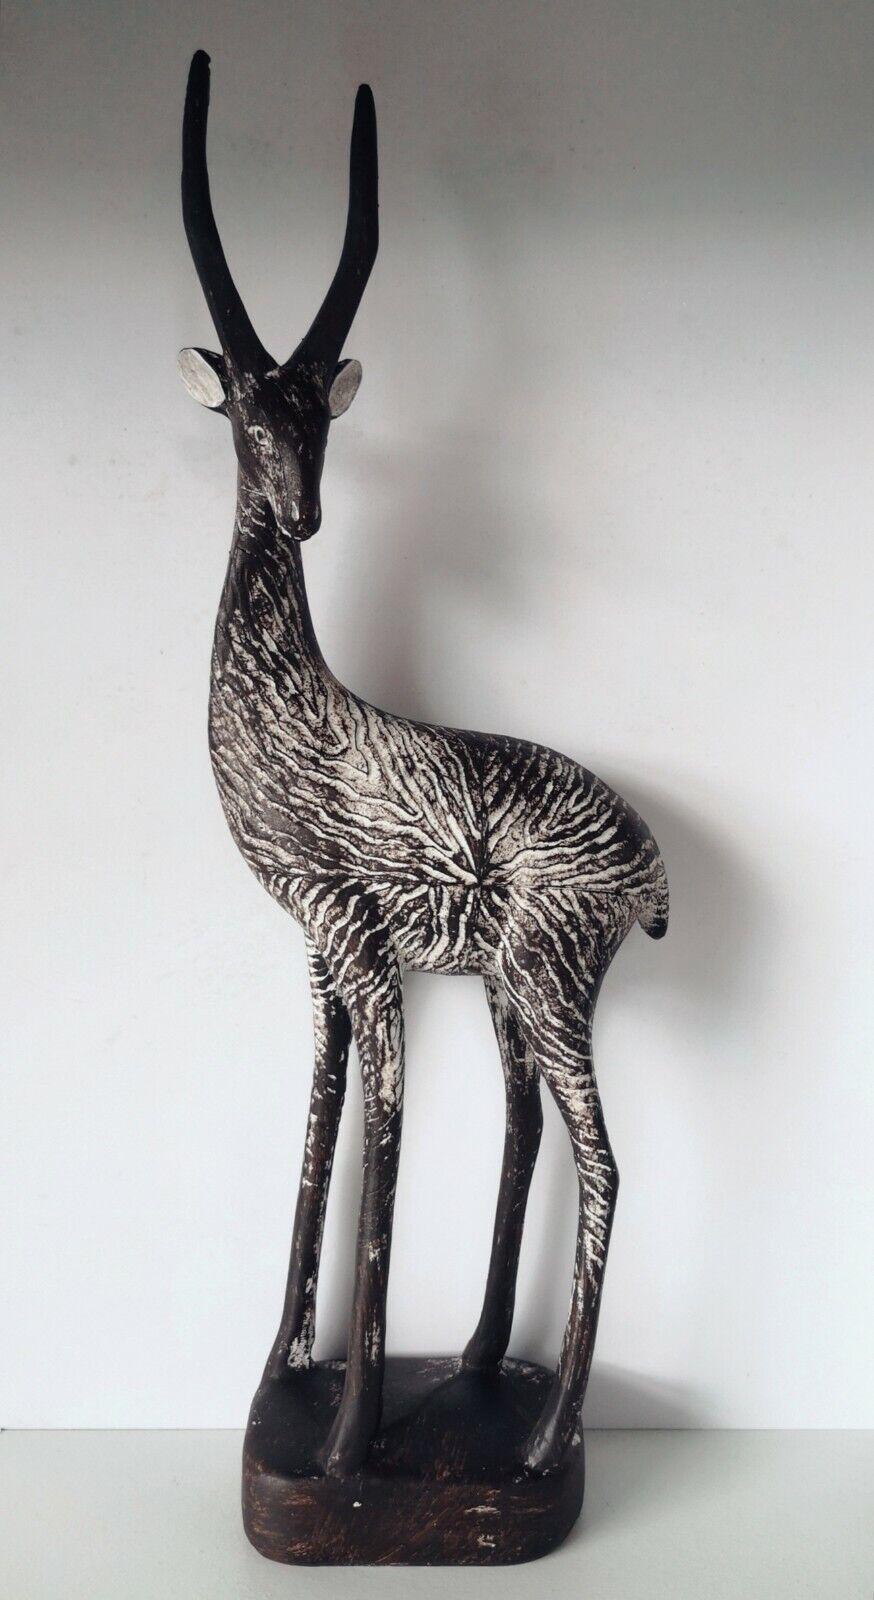 XL groß Deko Figur Gazelle Antilope braun Afrika Dekoobjekt Skulptur Statue